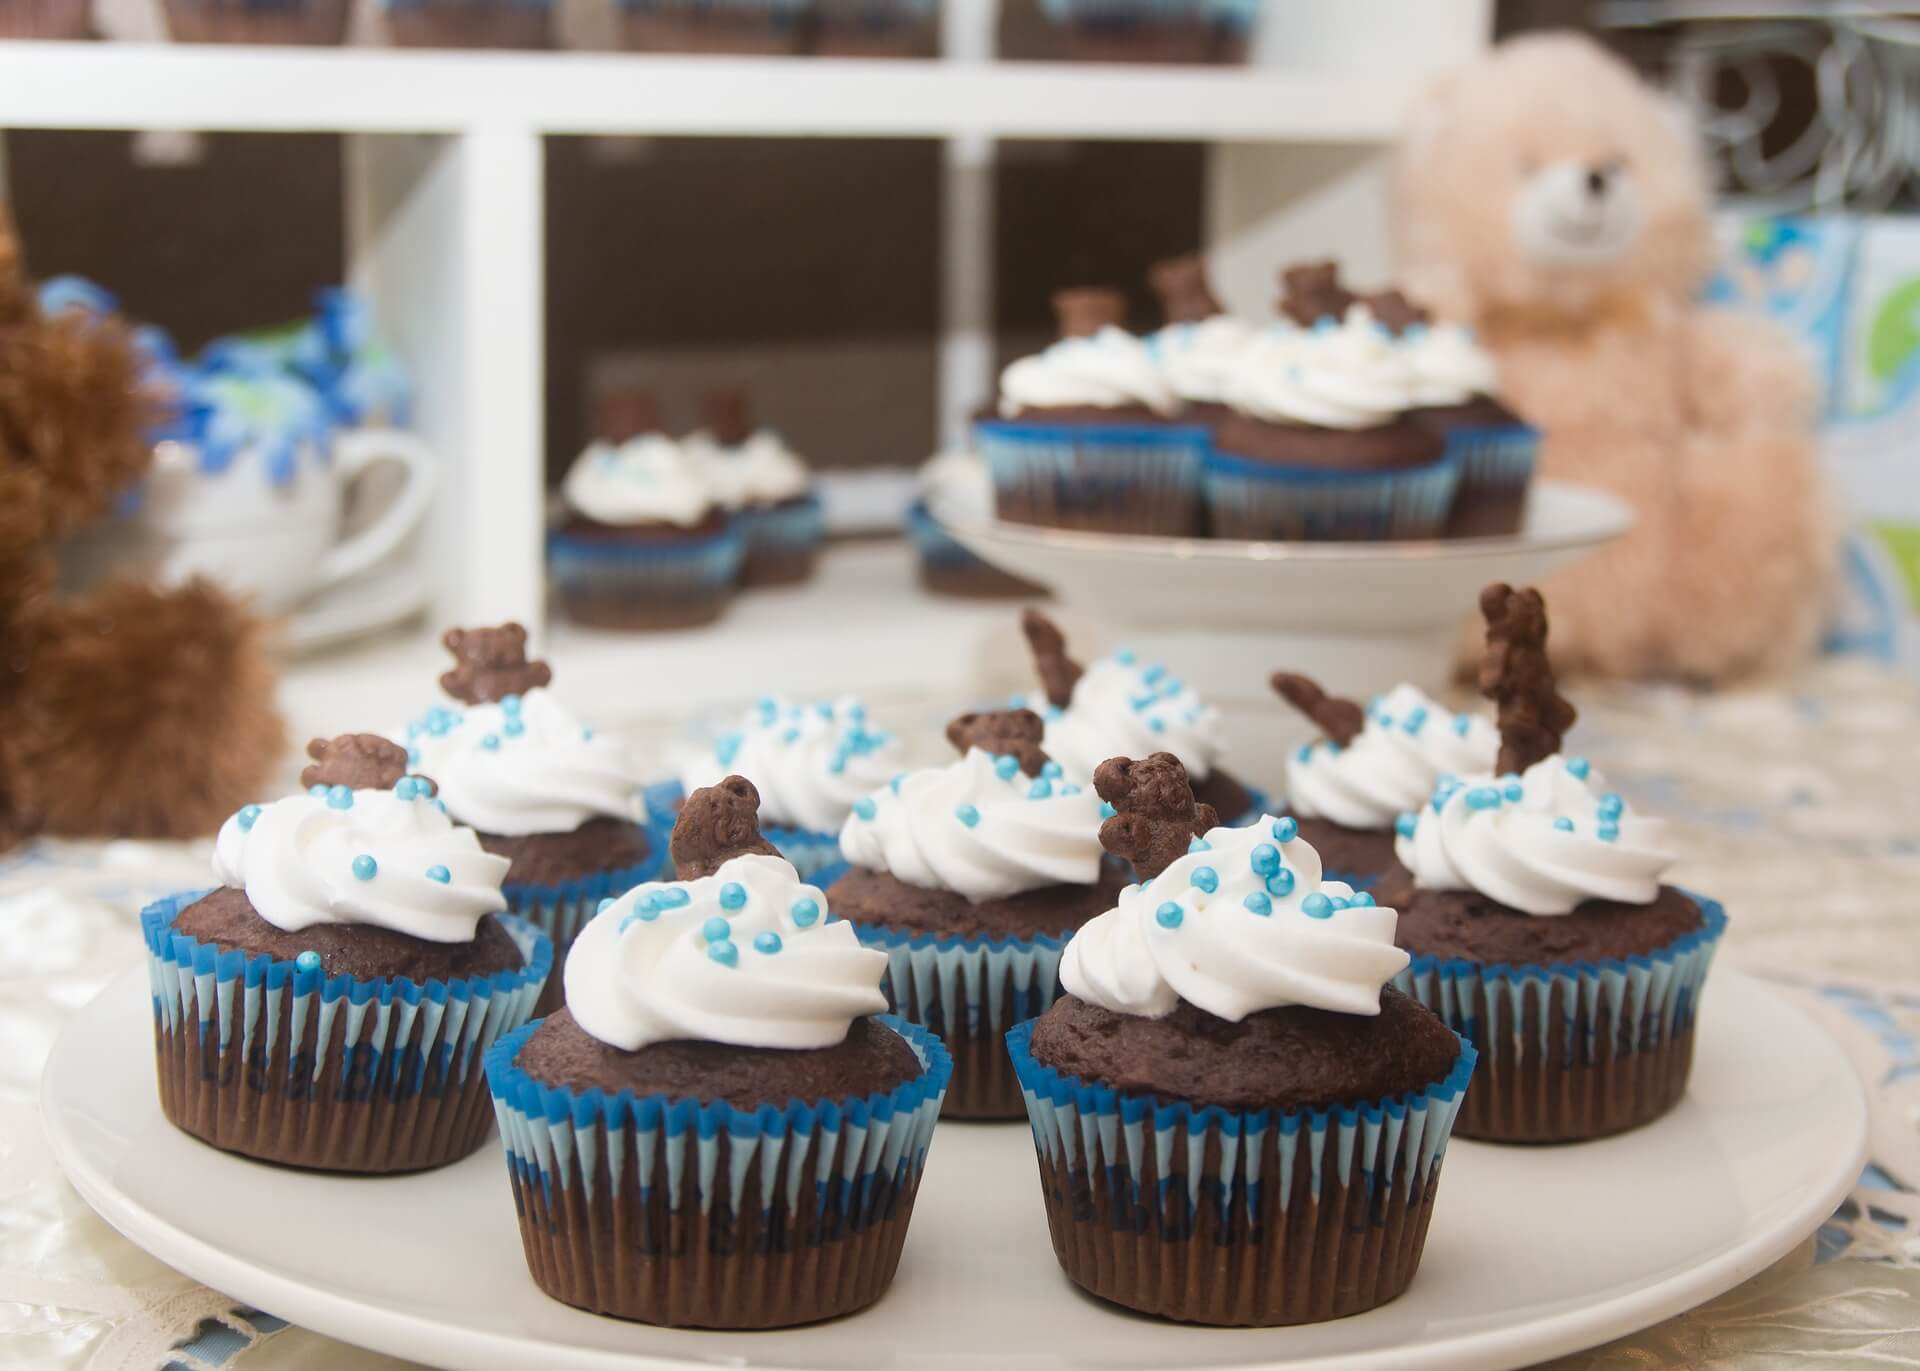 cupcakes du buffet sucré d'un baby shower